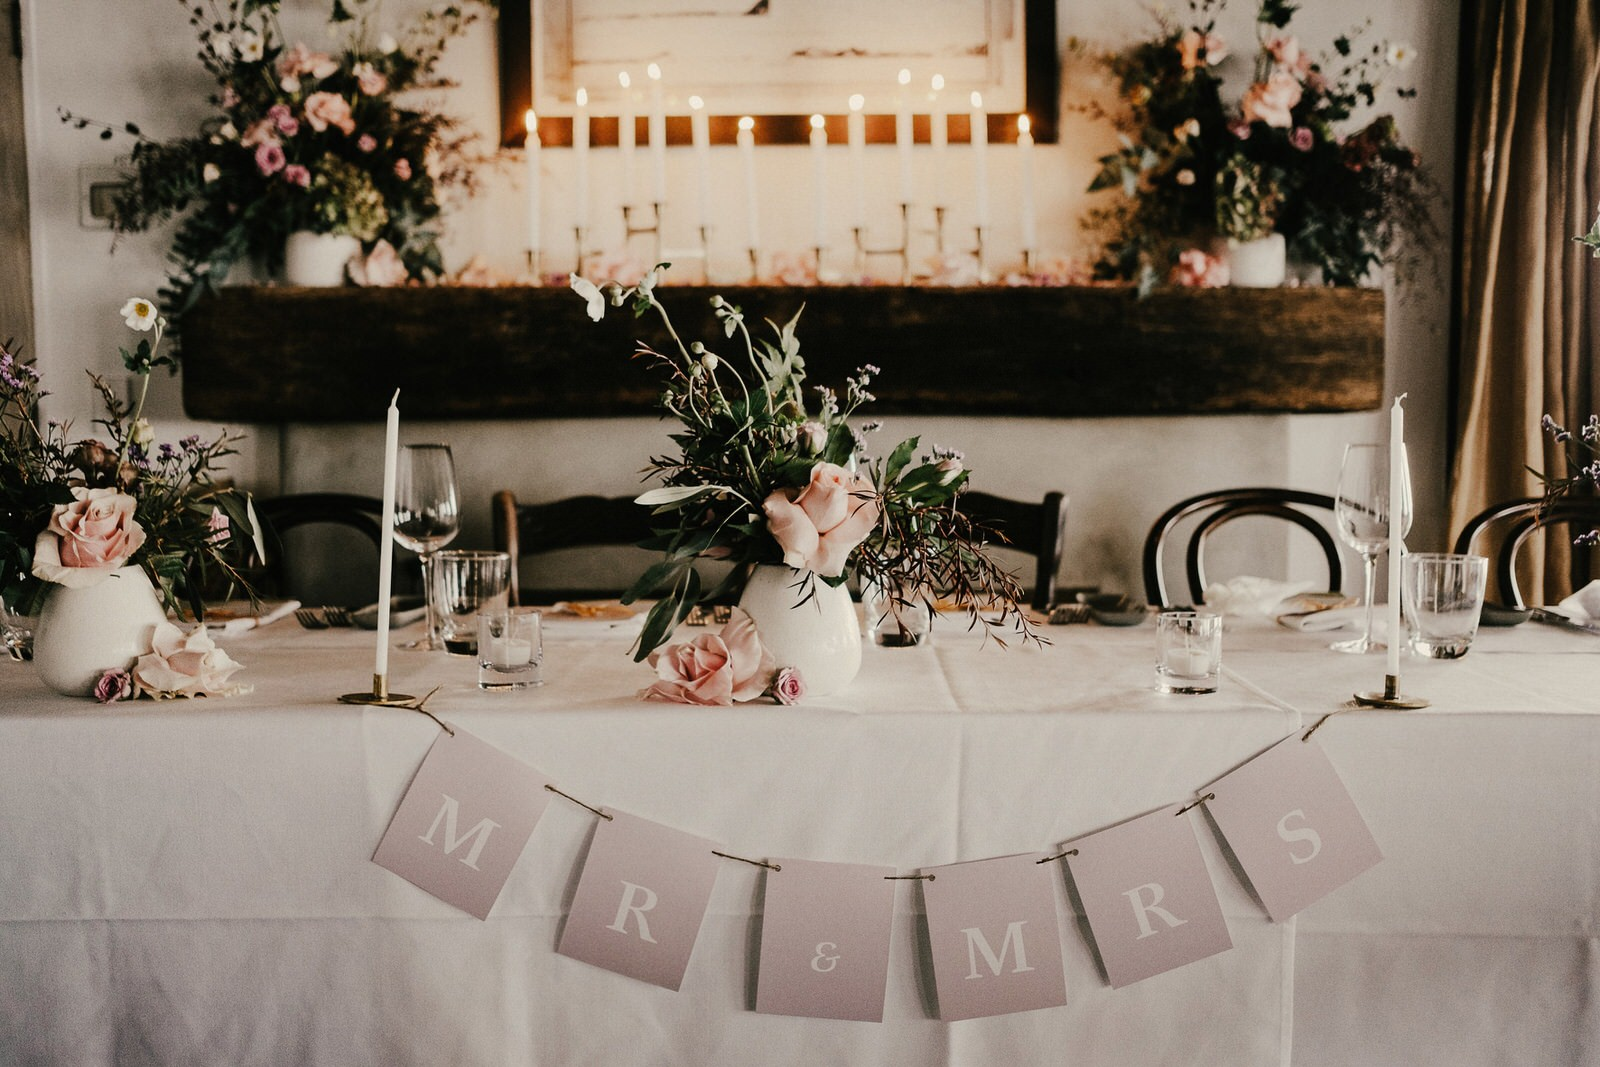 Wedding rustic style ideas